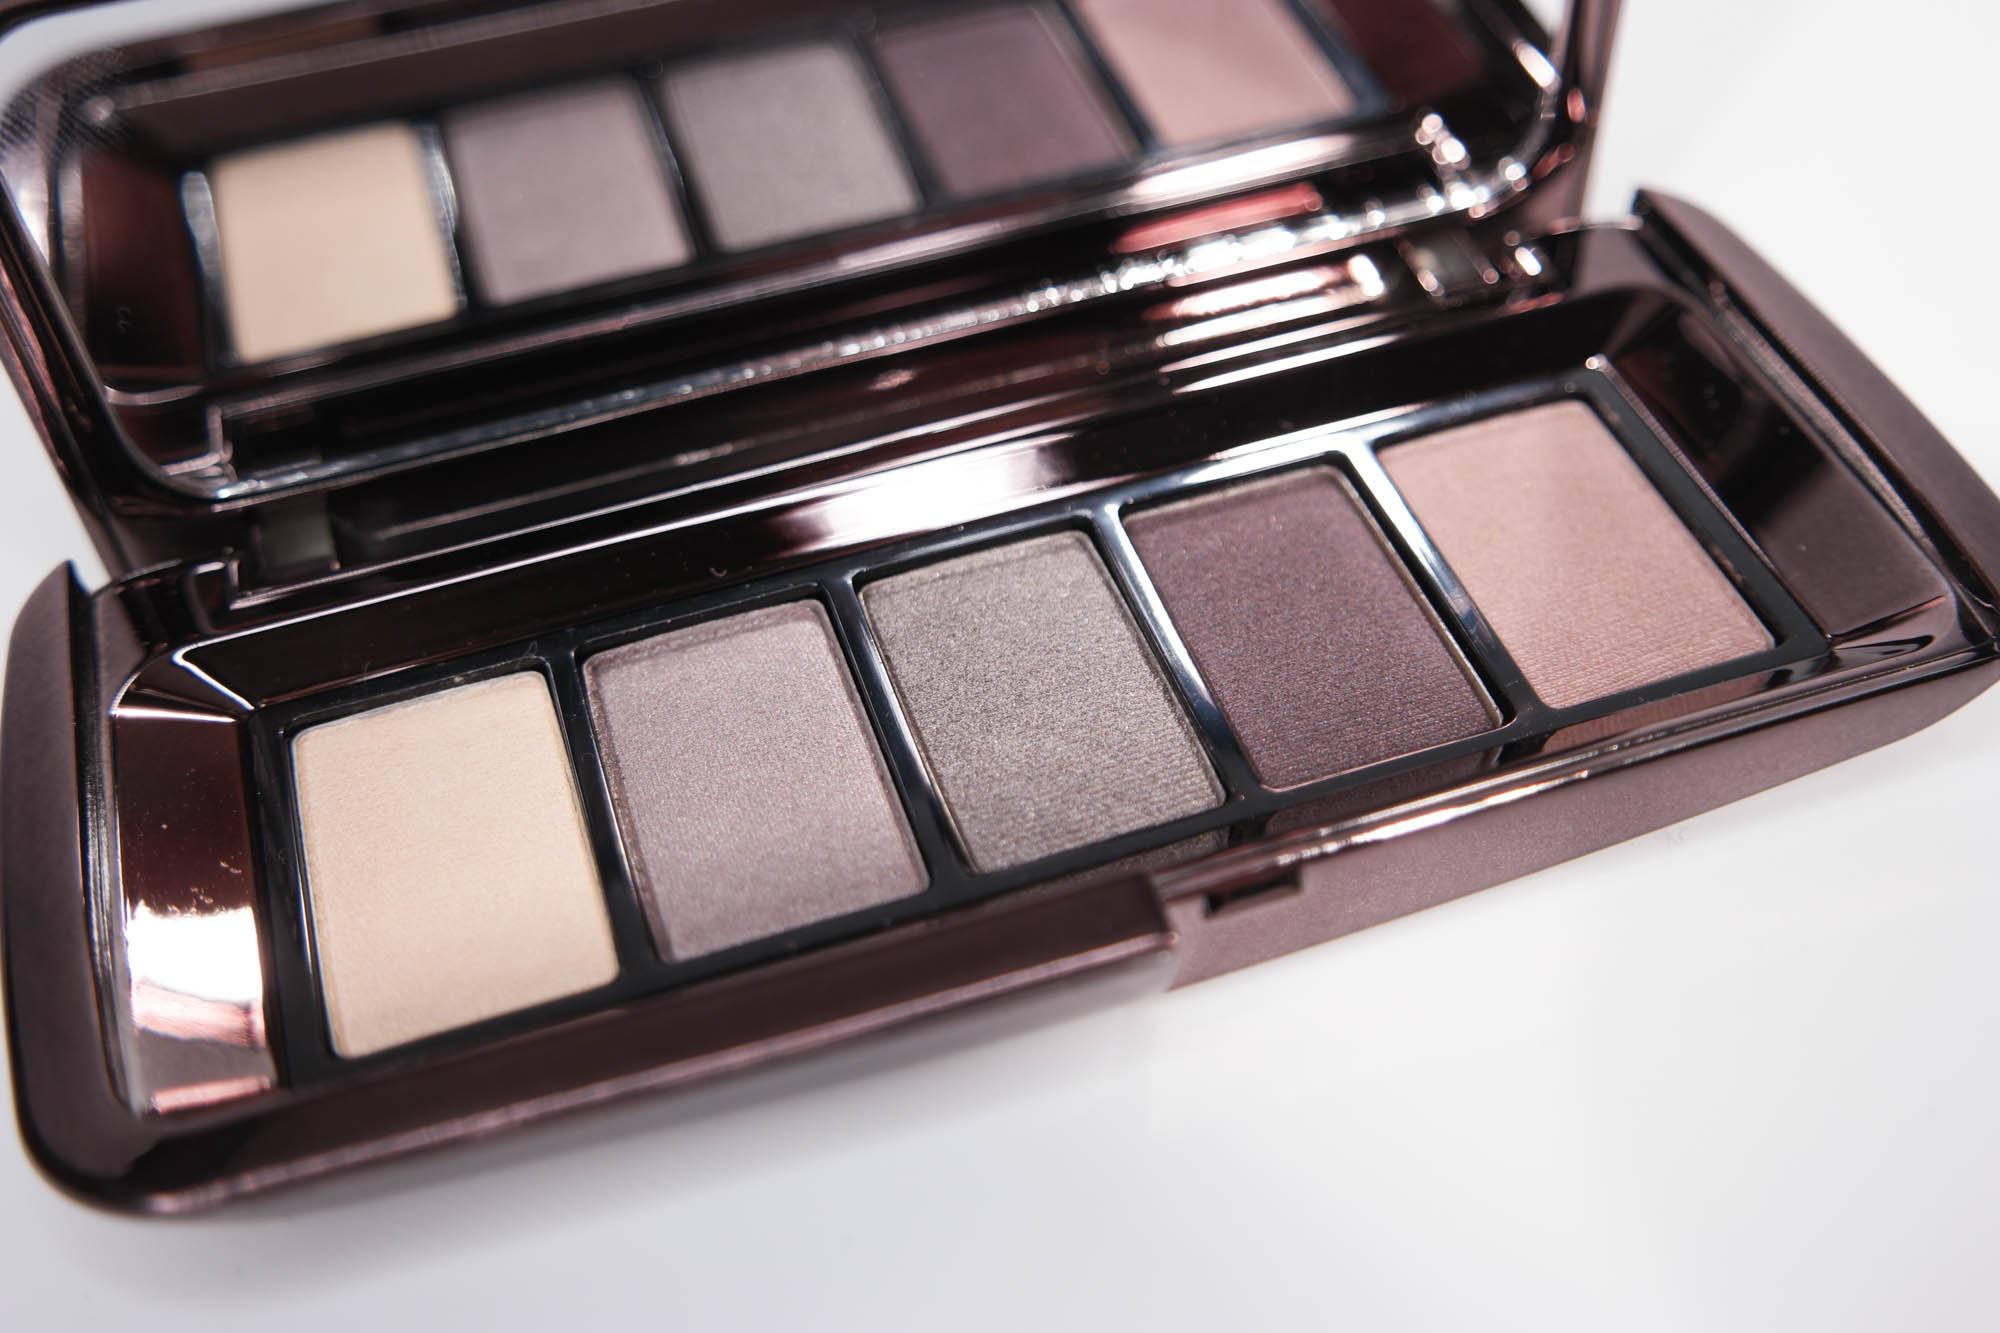 Hourglass Graphik Eyeshadow Review Expose